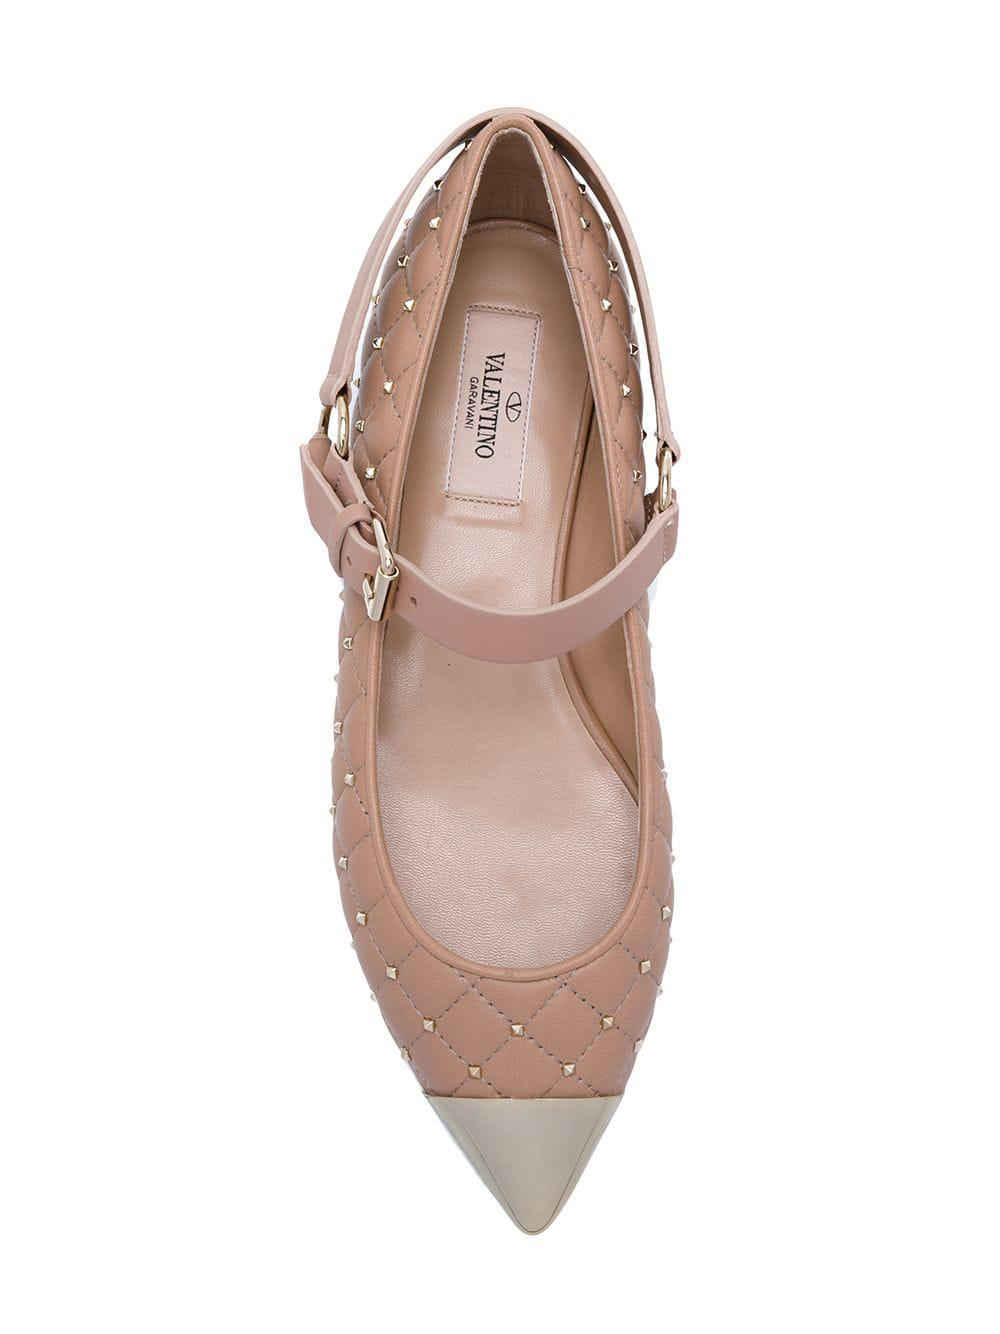 fe690bded64b Valentino - Pink Garavani Rockstud Spike Ballerinas - Lyst. View fullscreen